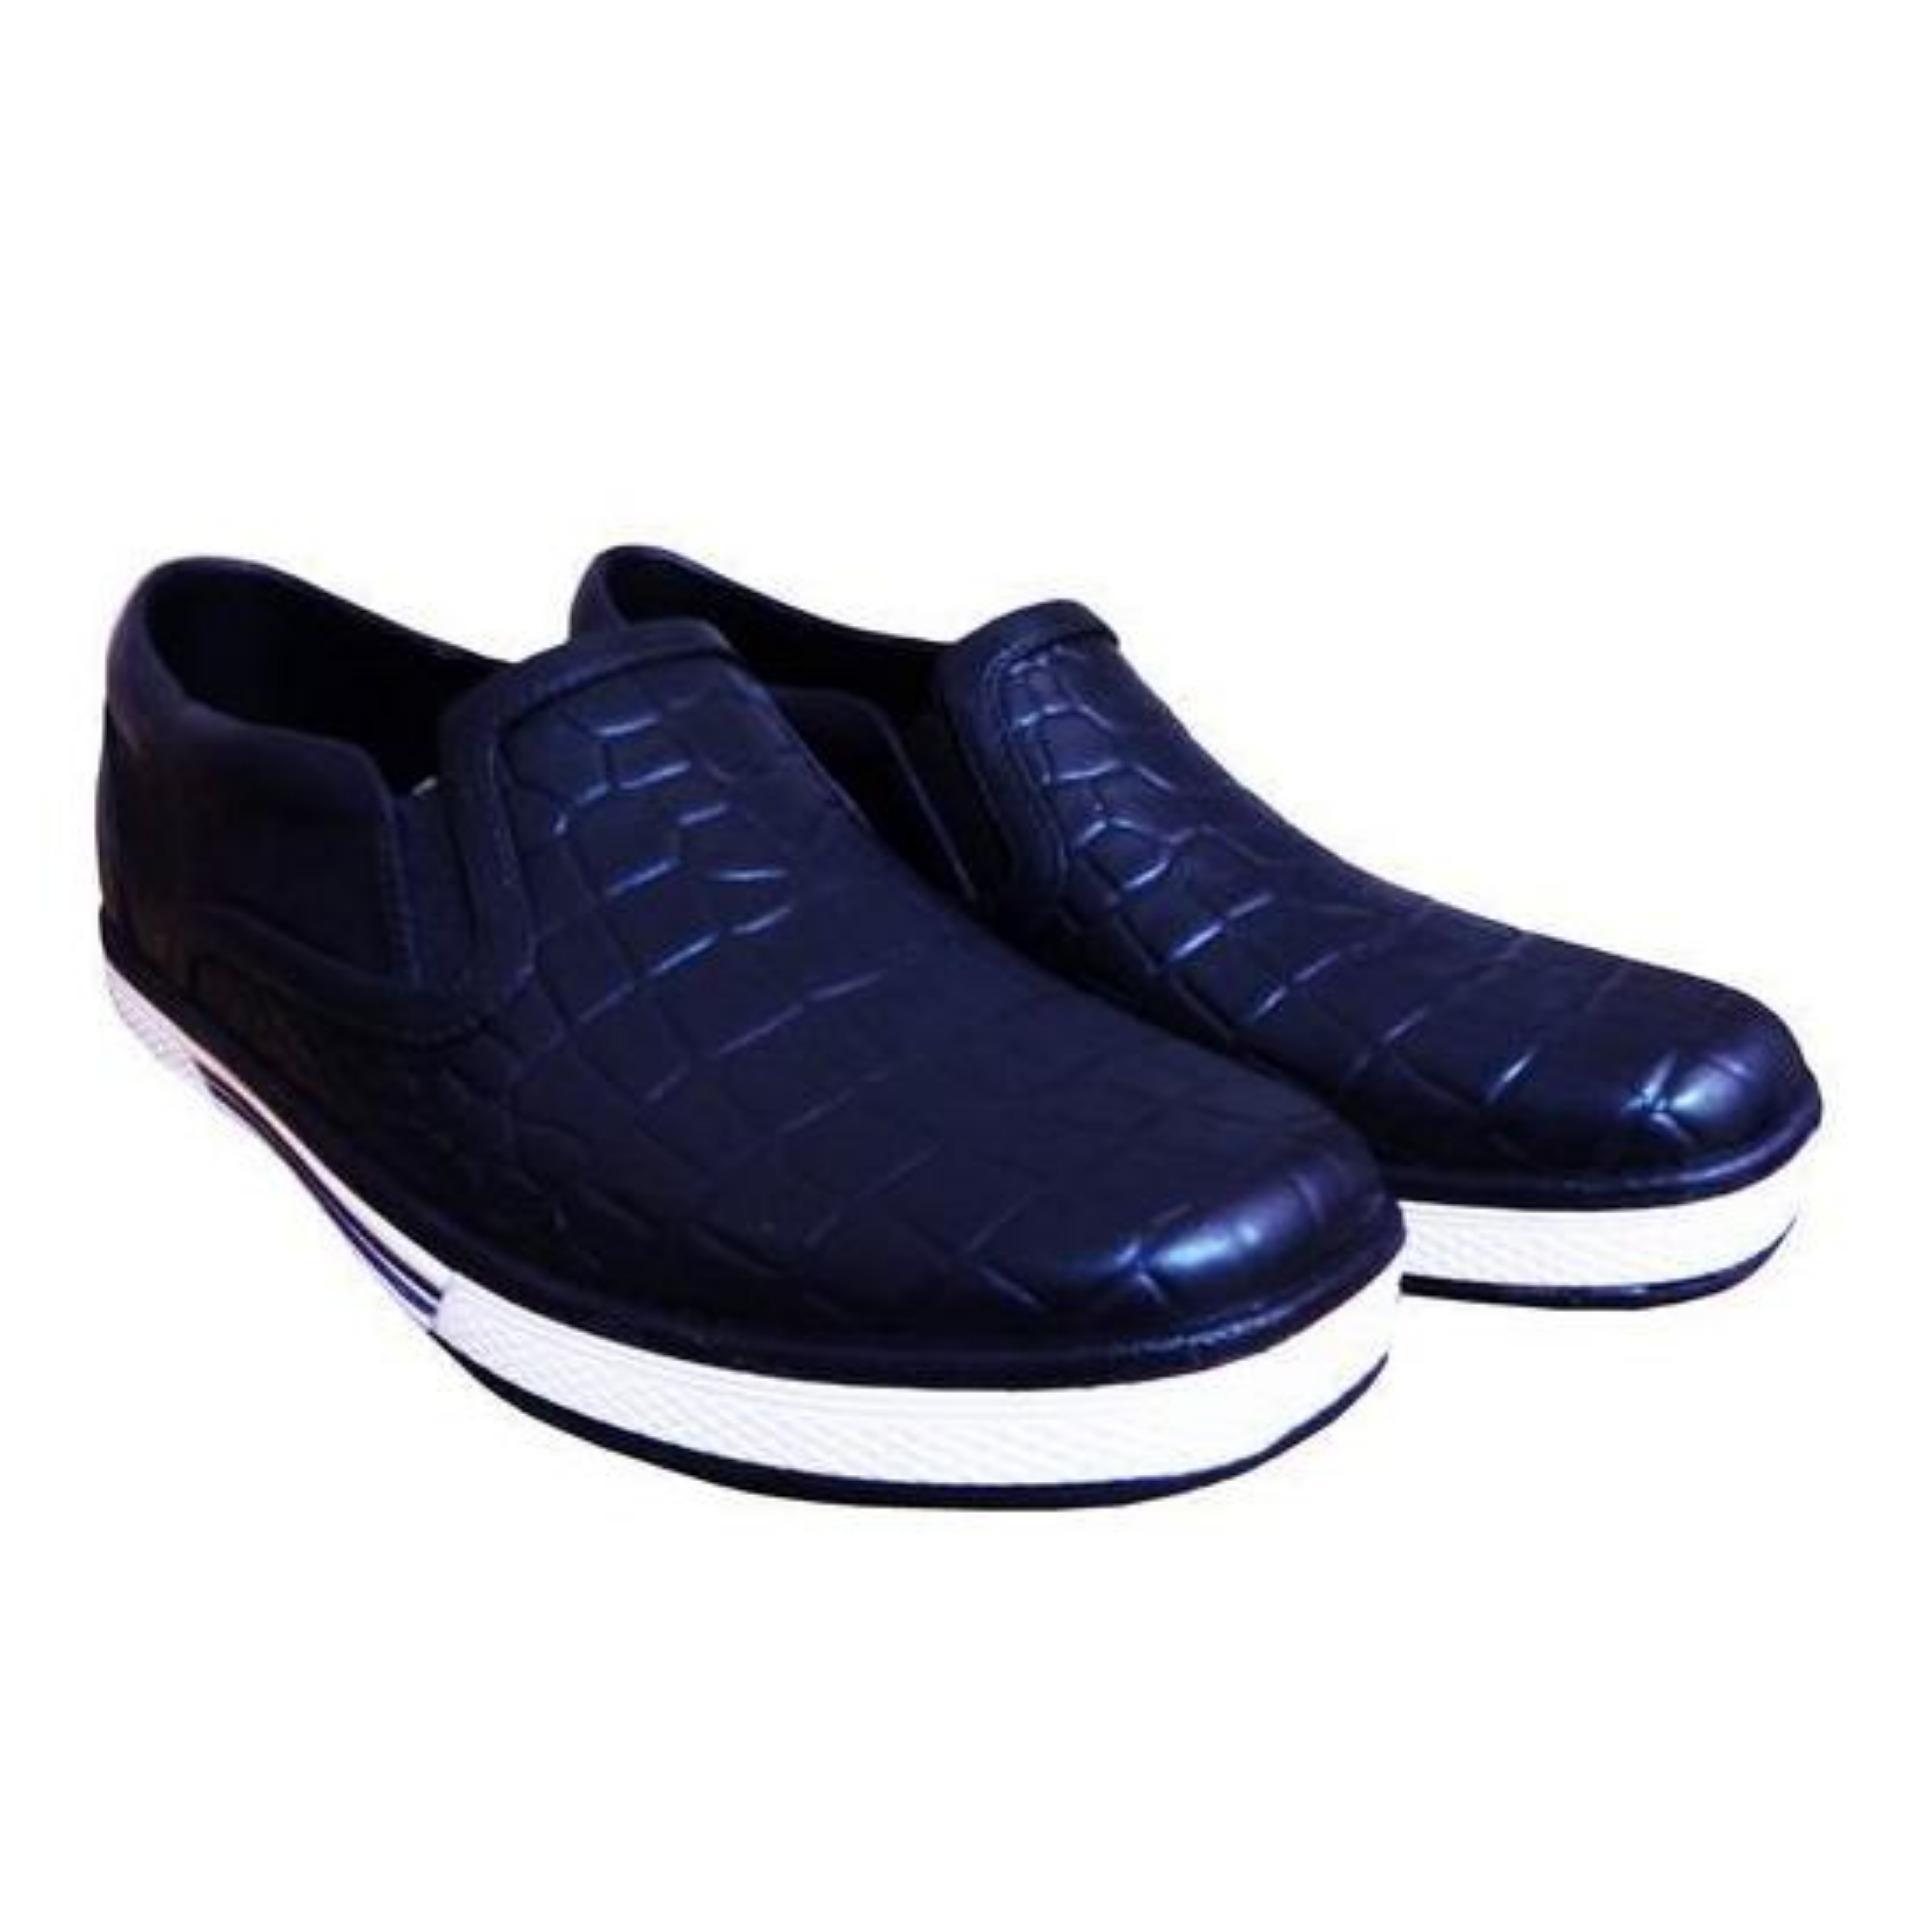 ATT Sepatu Pria BOS 1130 Biru Tua Slip On Sepatu Karet Motif Kulit Buaya